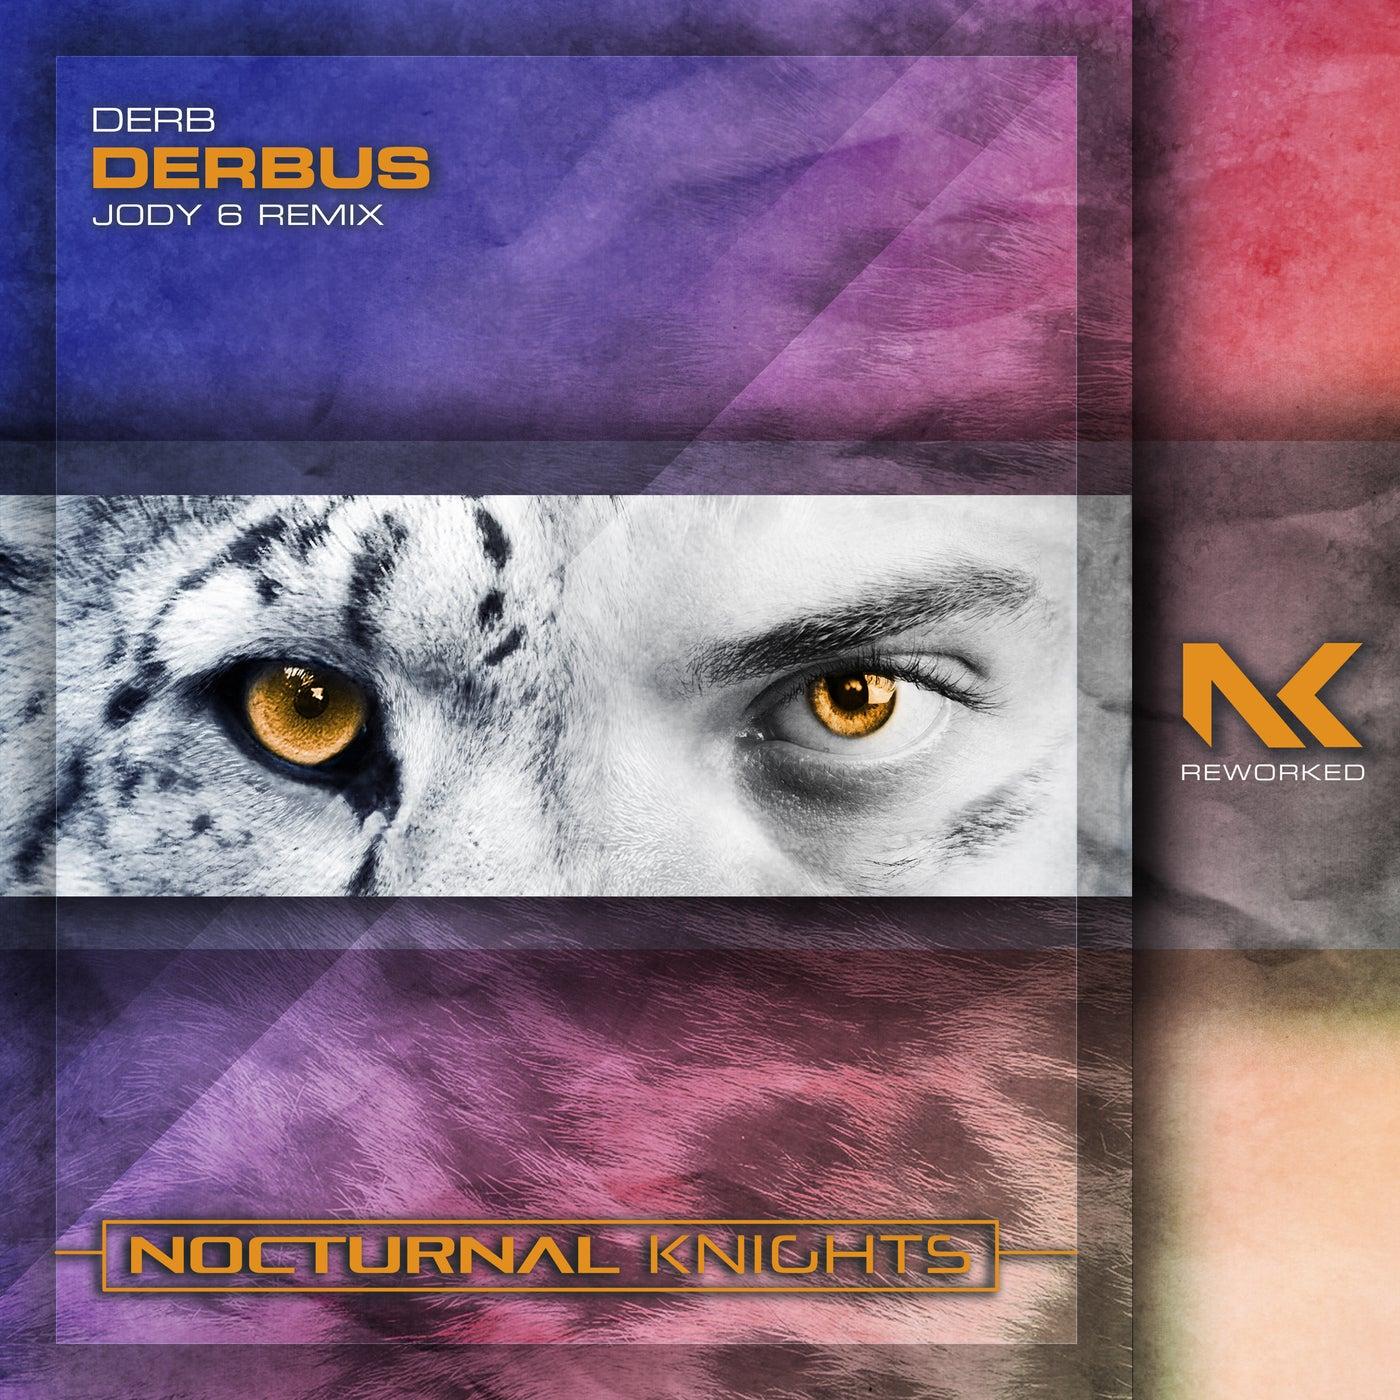 Derbus (Jody 6 Extended Remix)